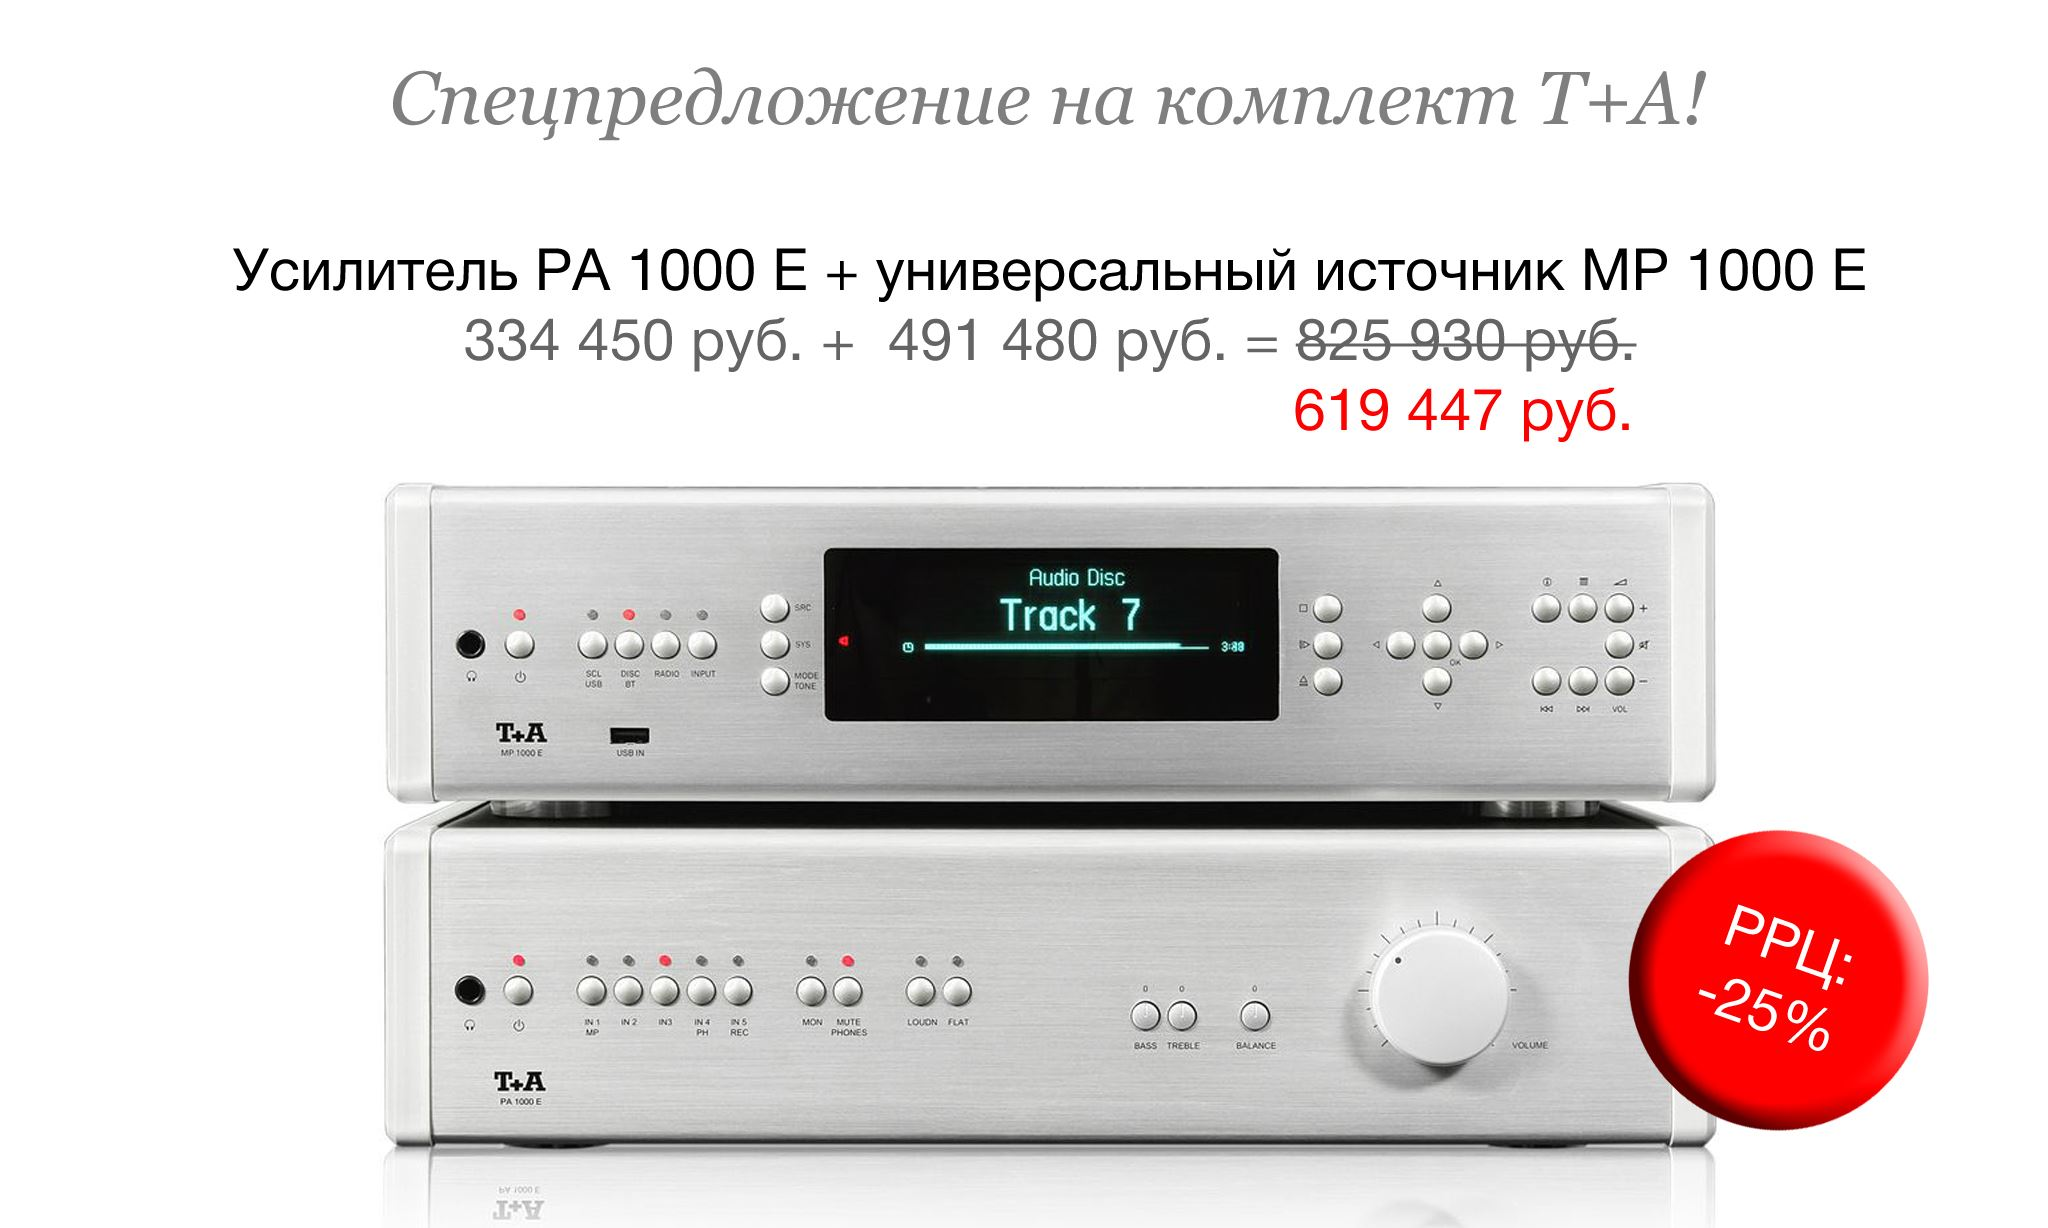 Т+А из серии Е 1000